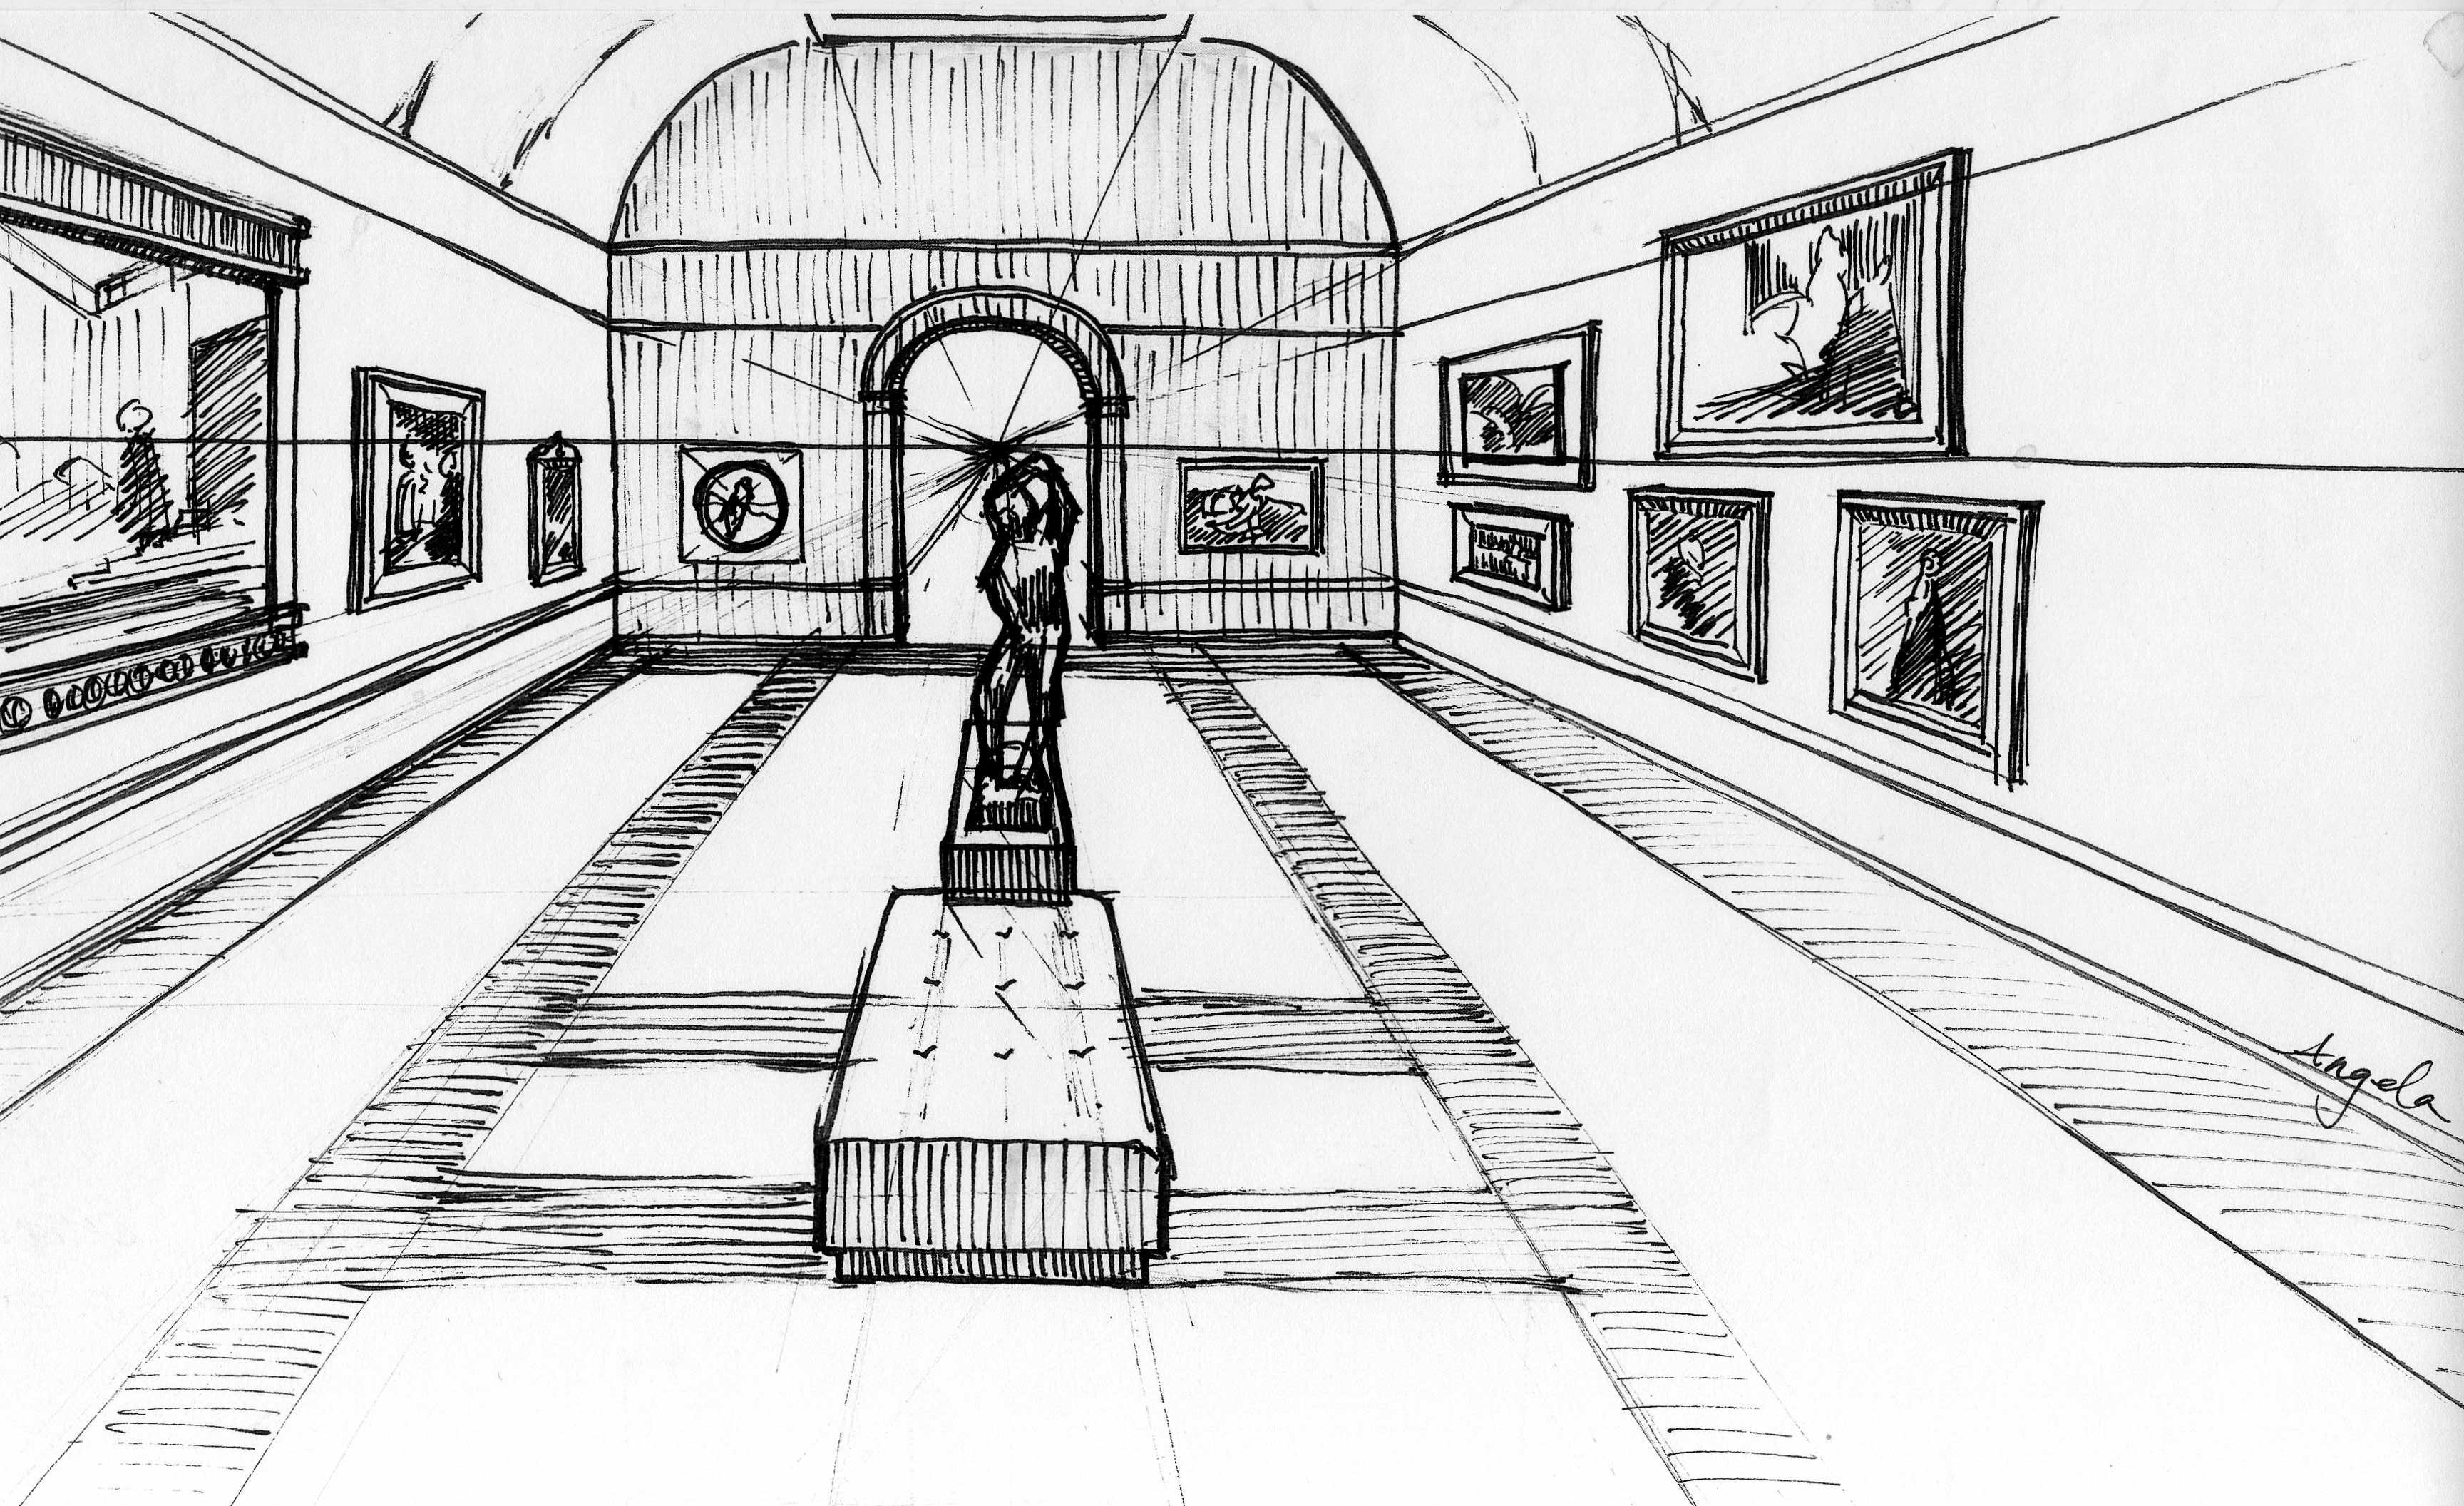 Museum Interior - Hand Sketch